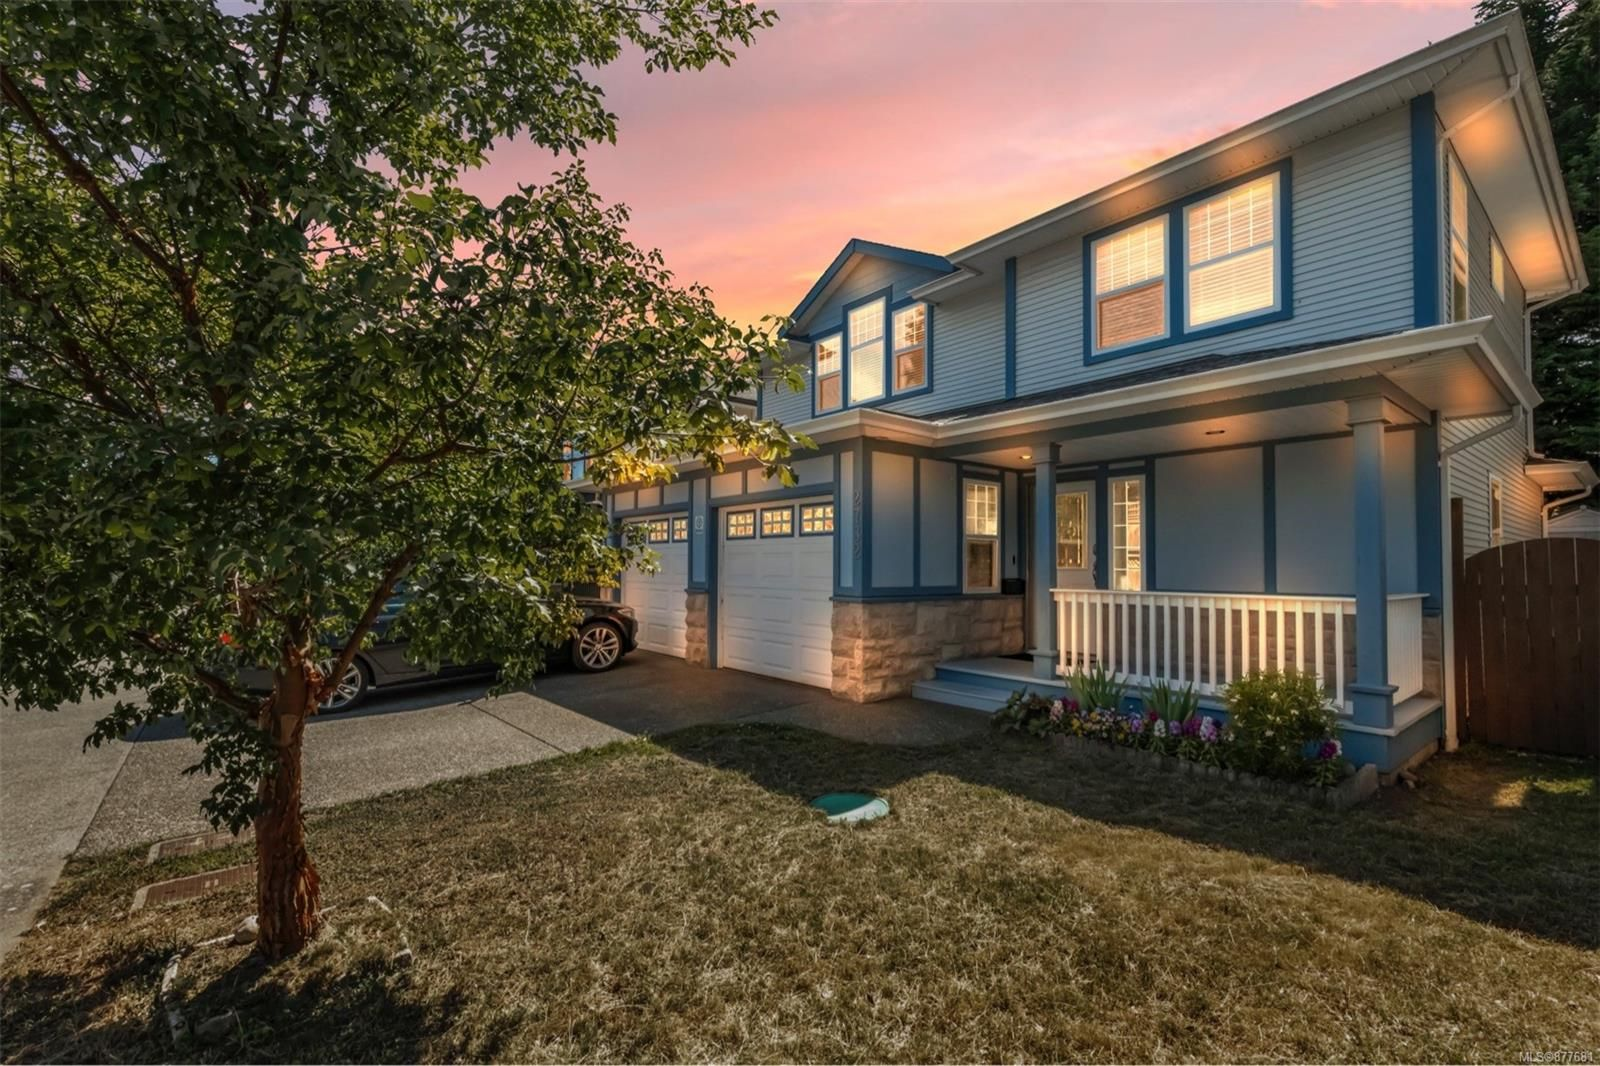 Main Photo: 2732 Windman Lane in : La Mill Hill House for sale (Langford)  : MLS®# 877681